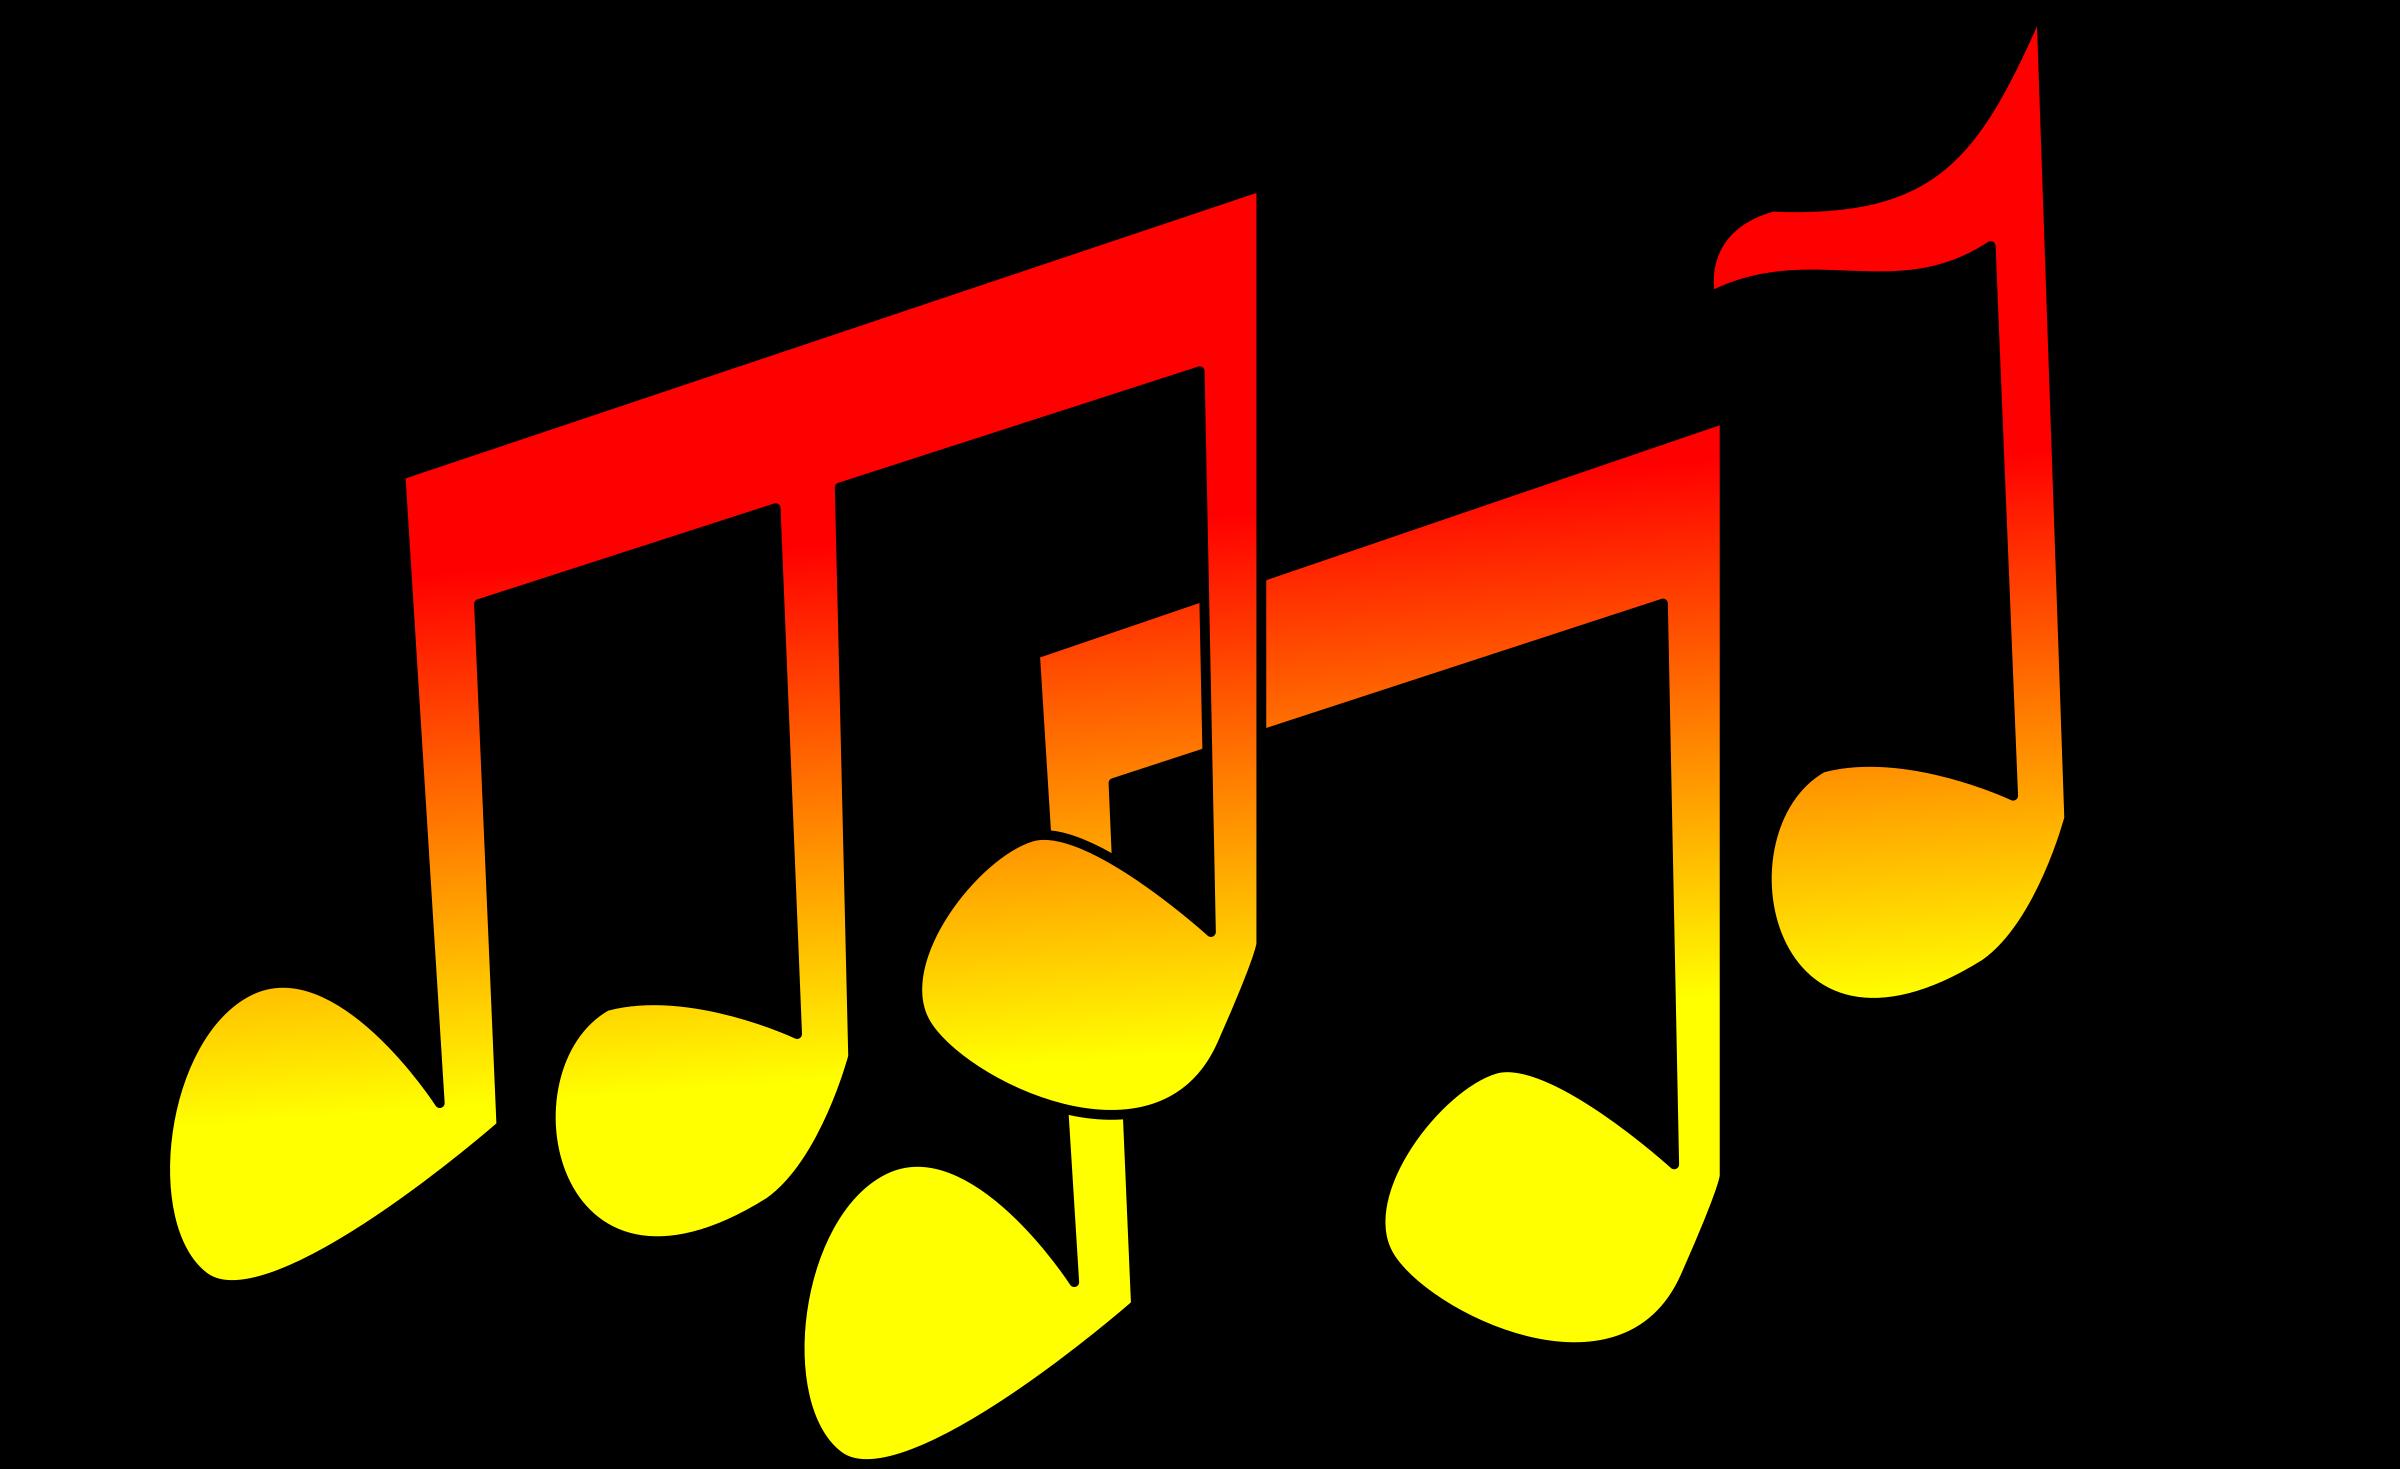 Paper big image png. Clipart music cartoon